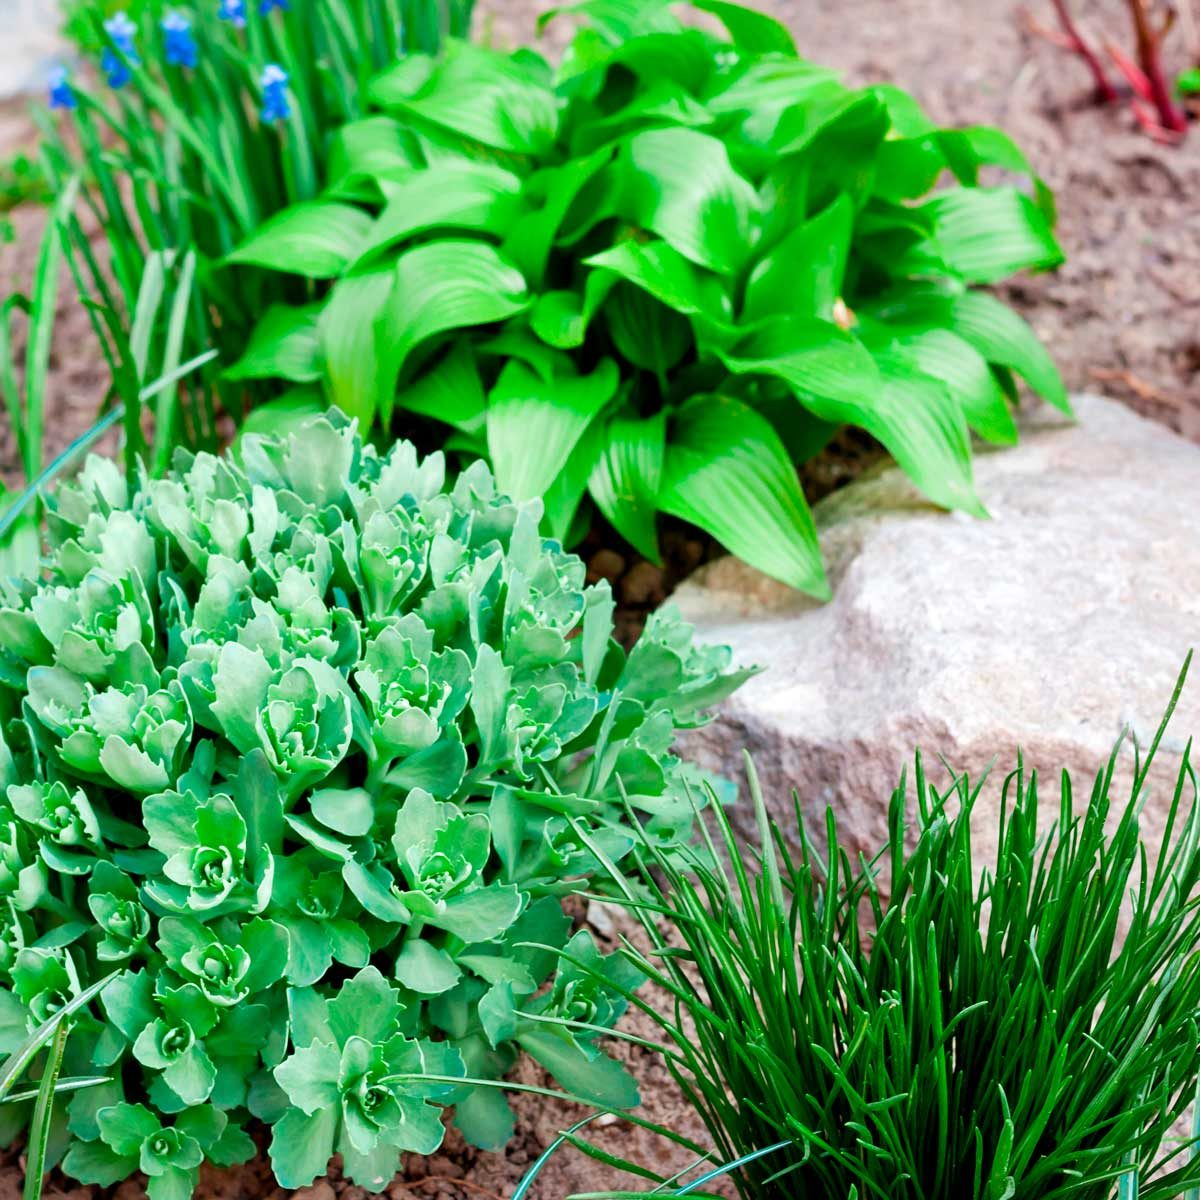 10 Tips to Create an Affordable Garden